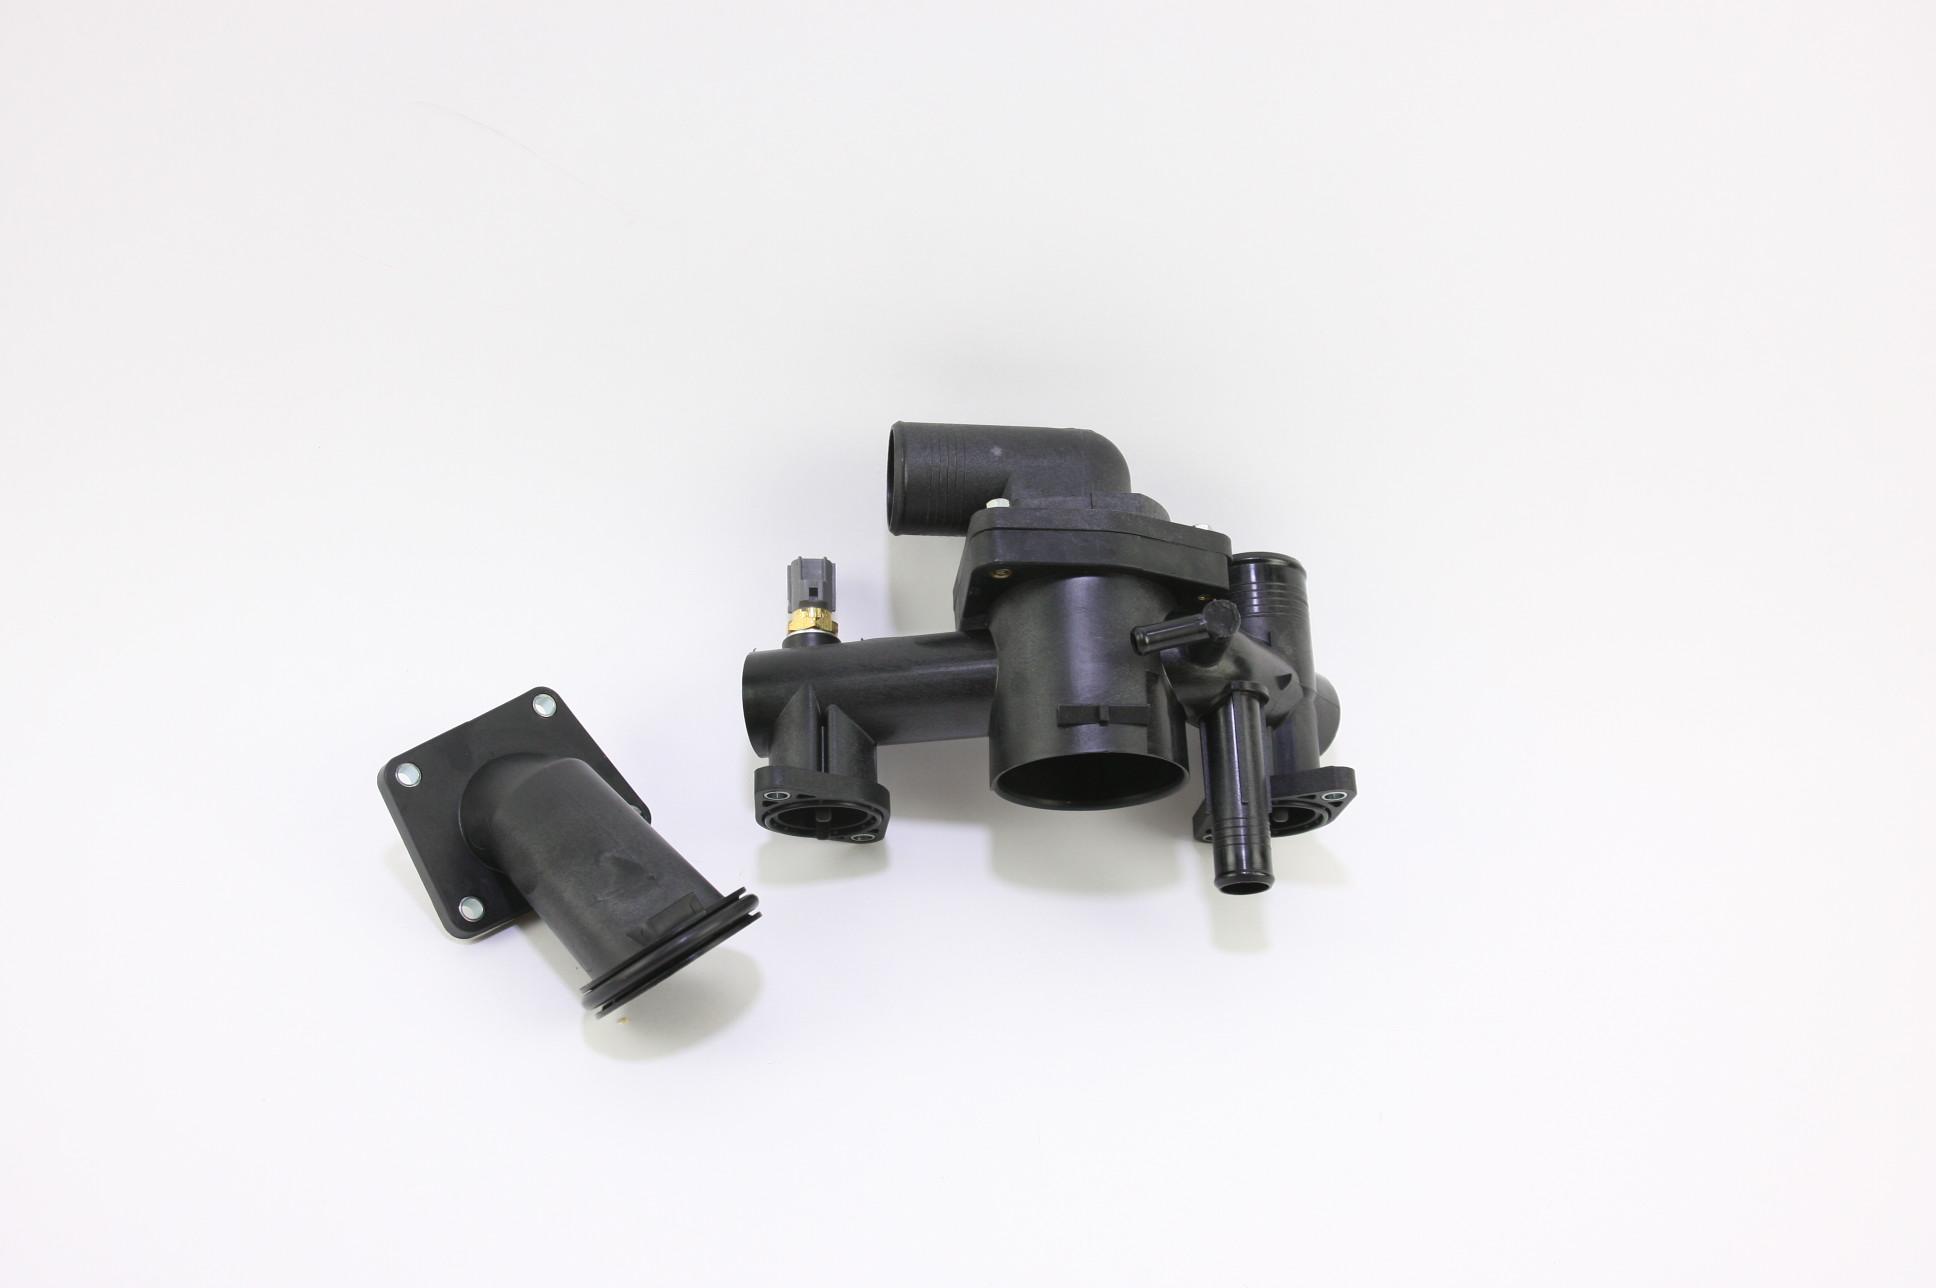 ** New OEM AJ89486 Jaguar 03-06 XK8 4.2L V8 Engine Coolant Thermostat Housing - image 1